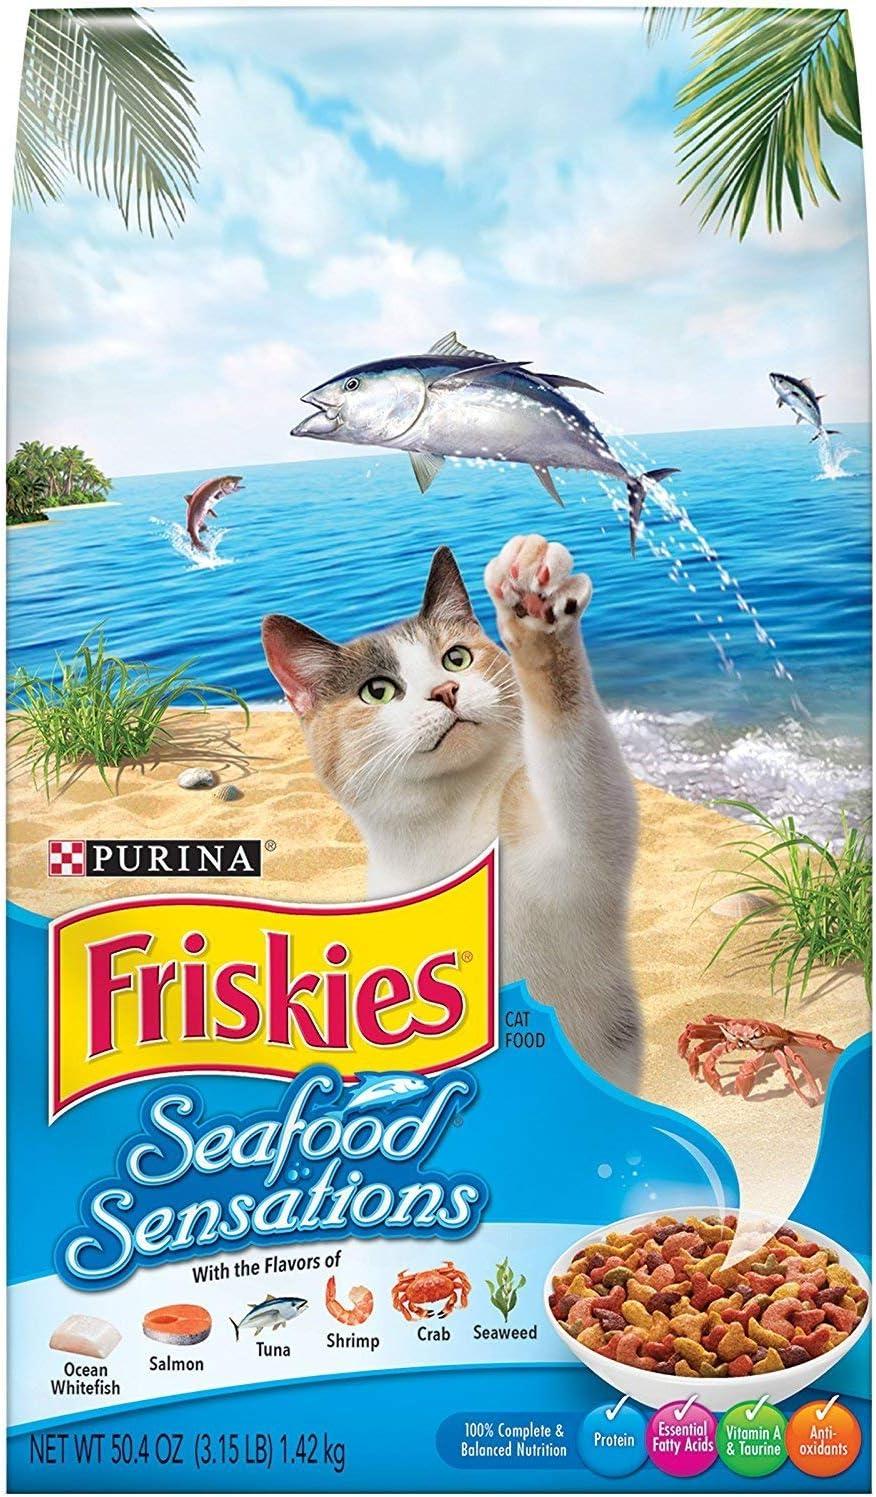 Purina Friskies Seafood Sensations Dry Cat Food, 3.15 lb. Bag (Pack of 2)